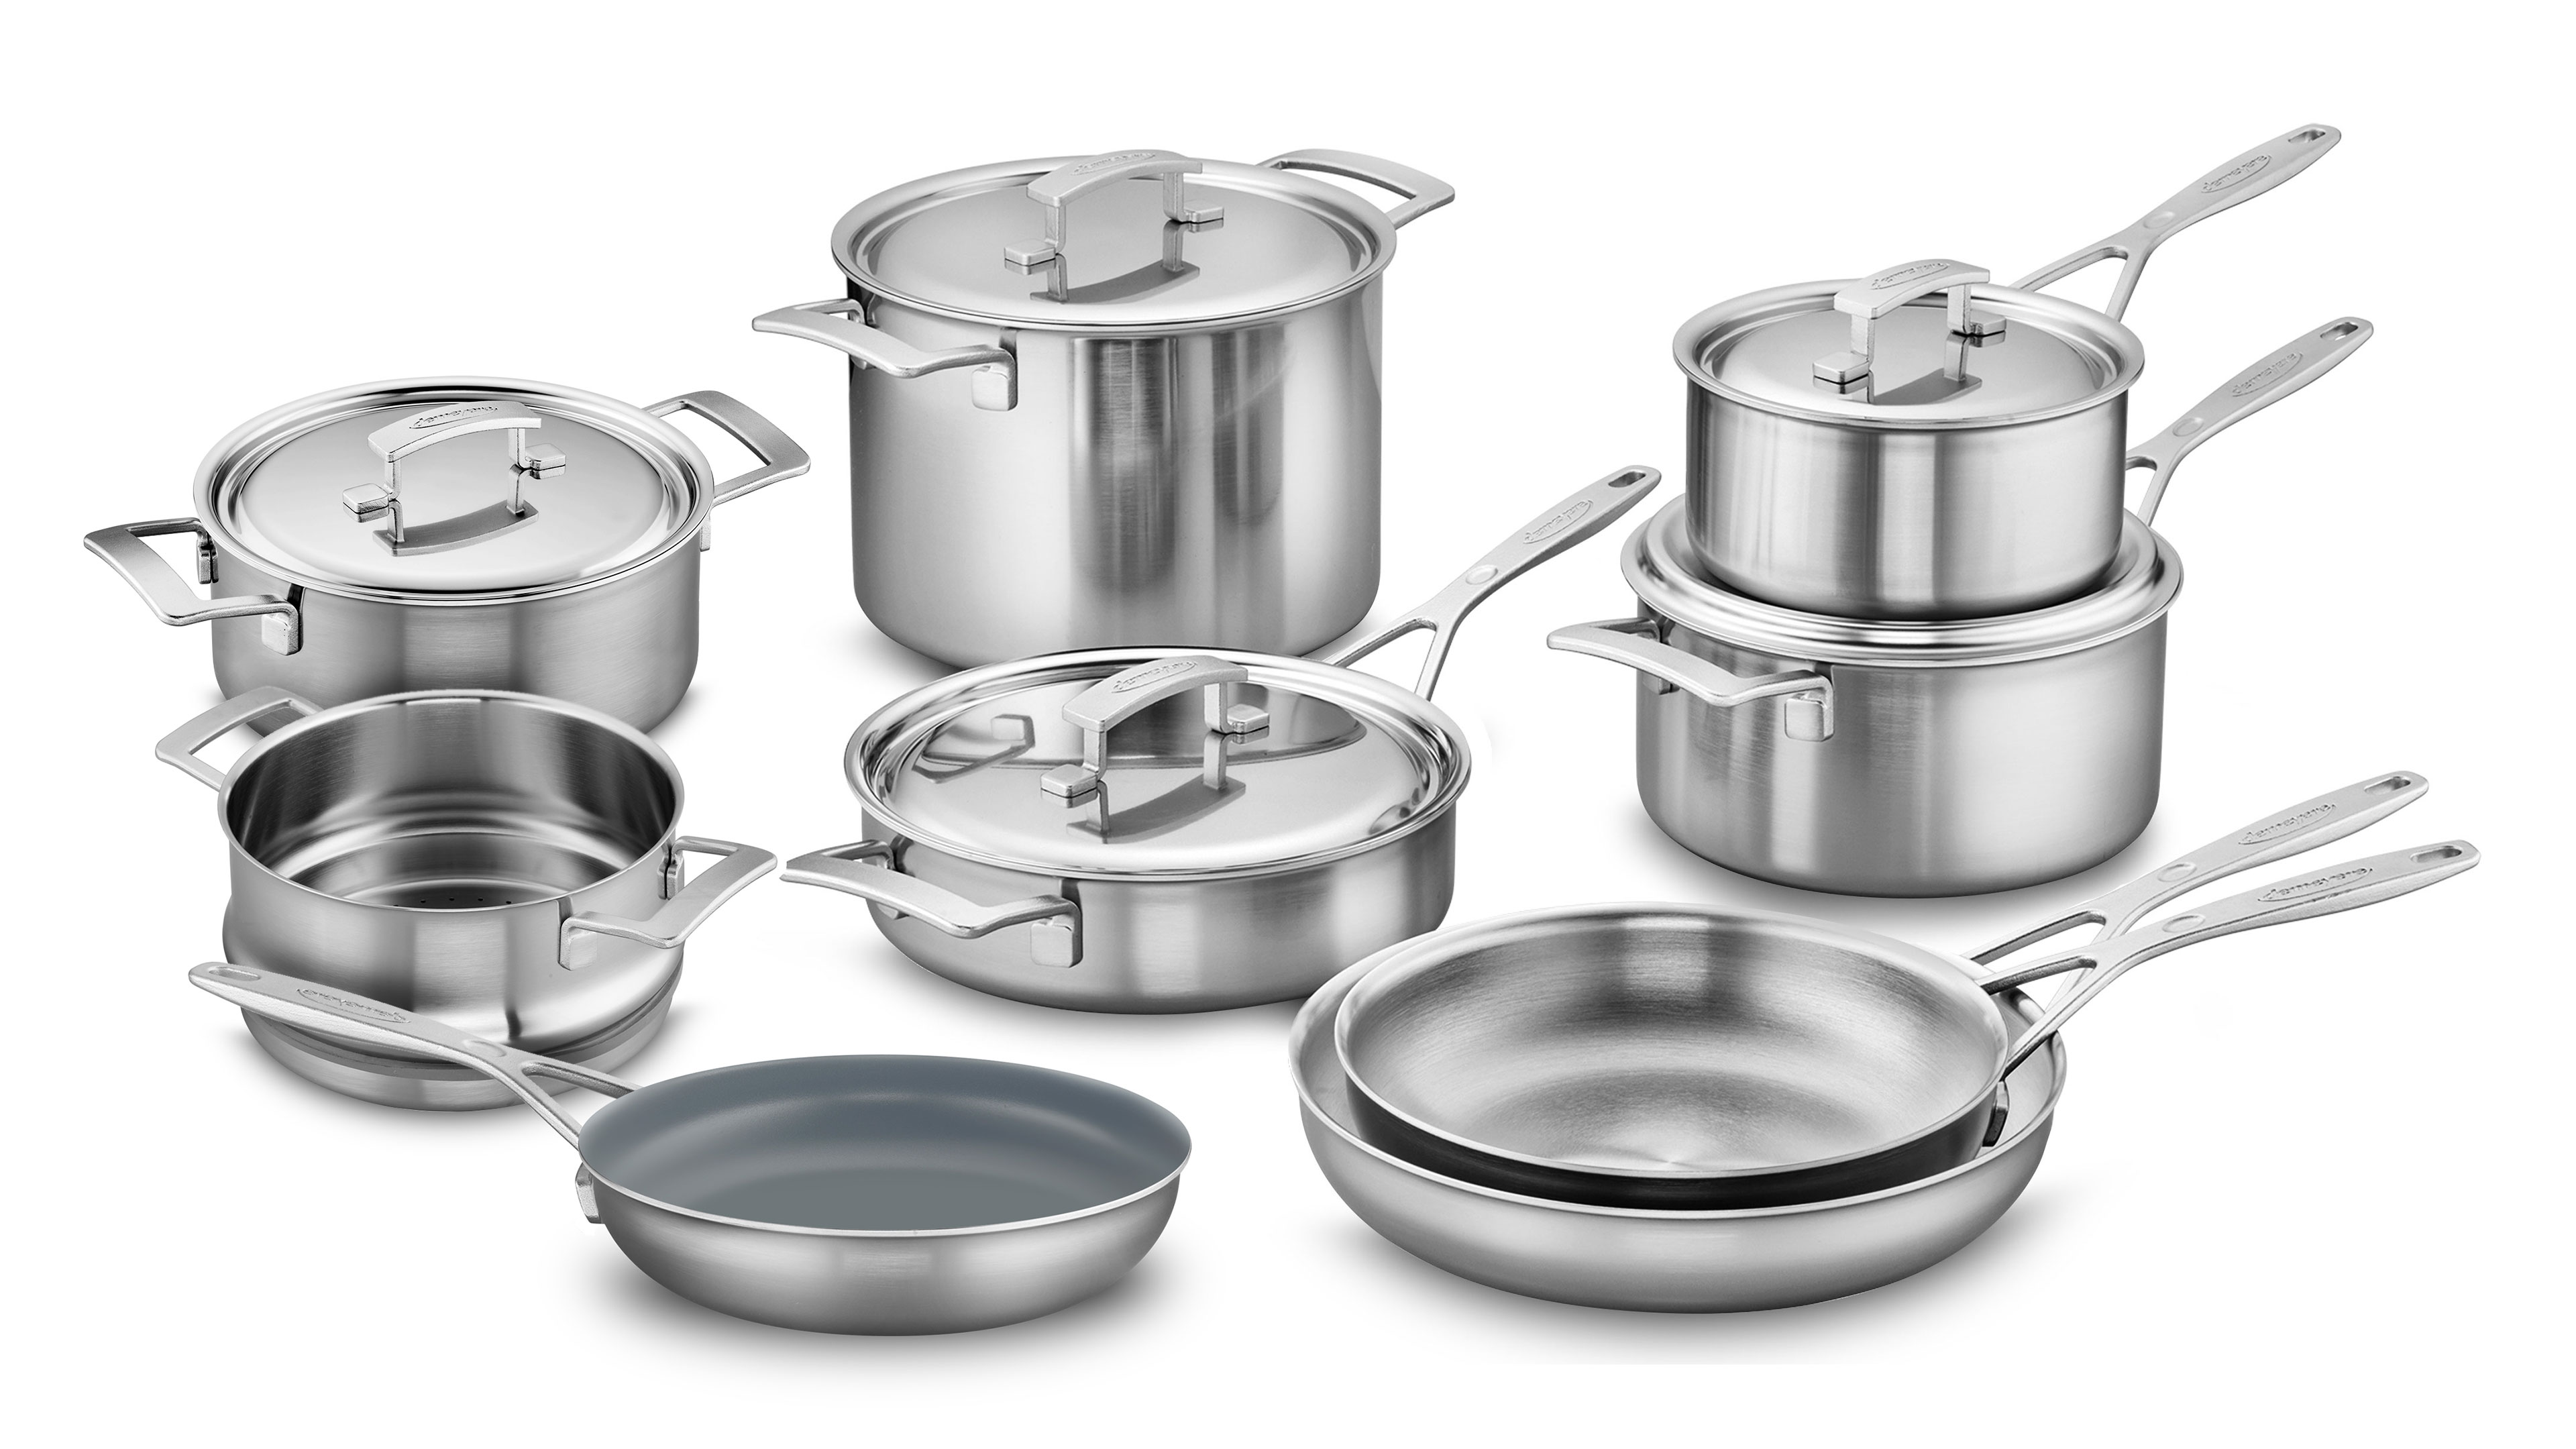 Demeyere Industry5 Stainless Steel Cookware Set 14 Piece